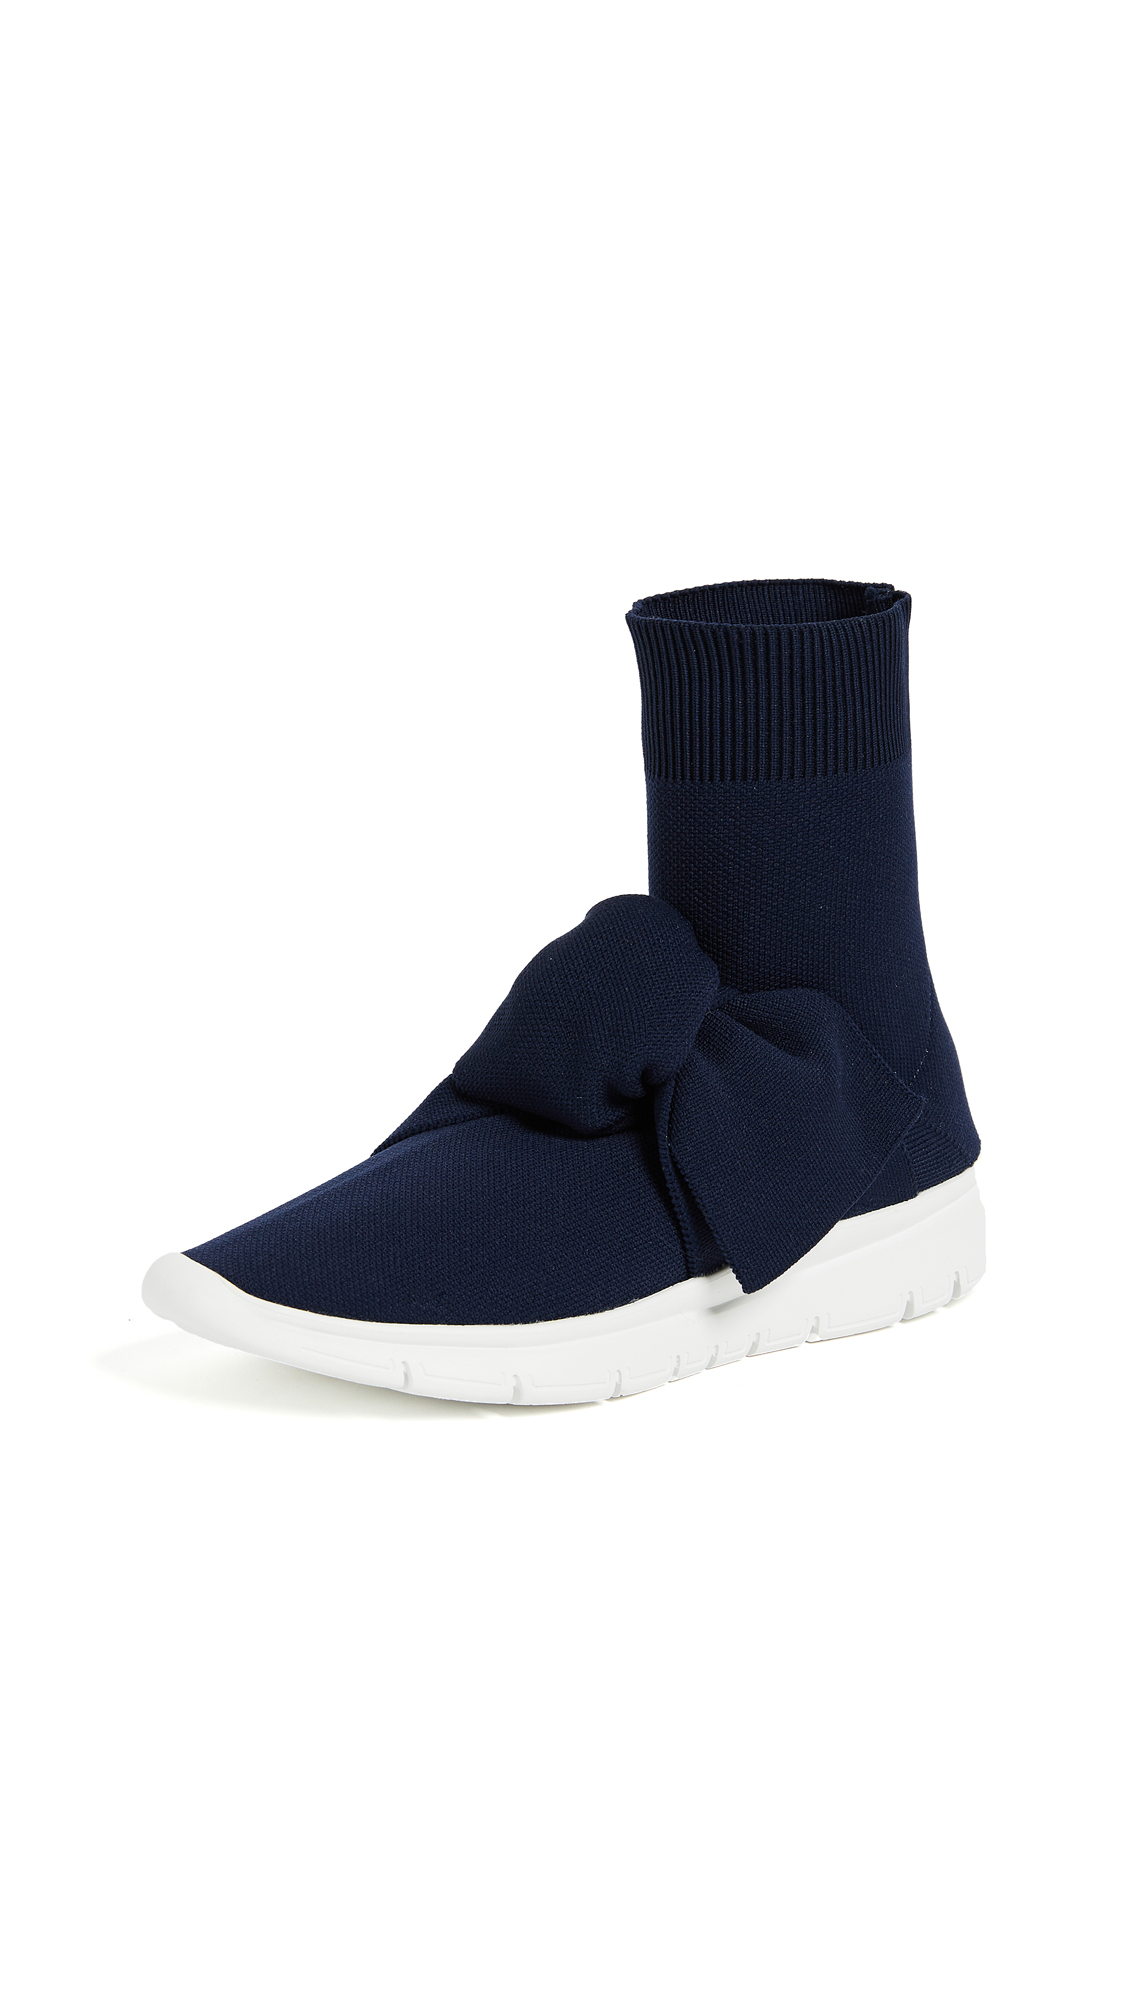 Joshua Sanders Sock Knot Sneakers - Blue